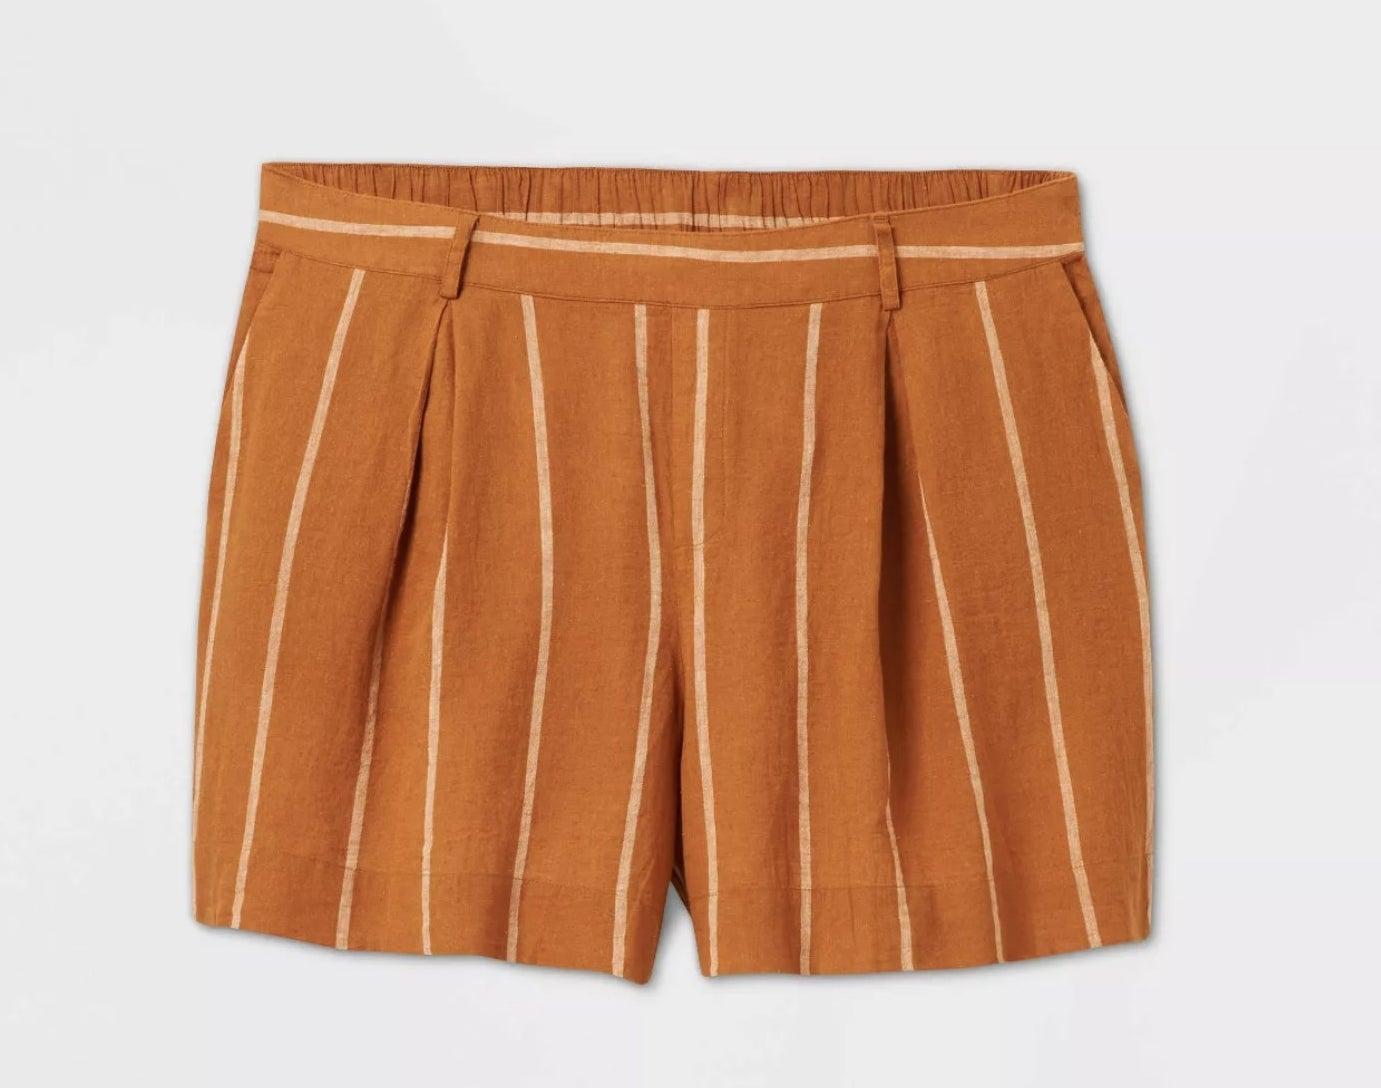 orange and white striped shorts